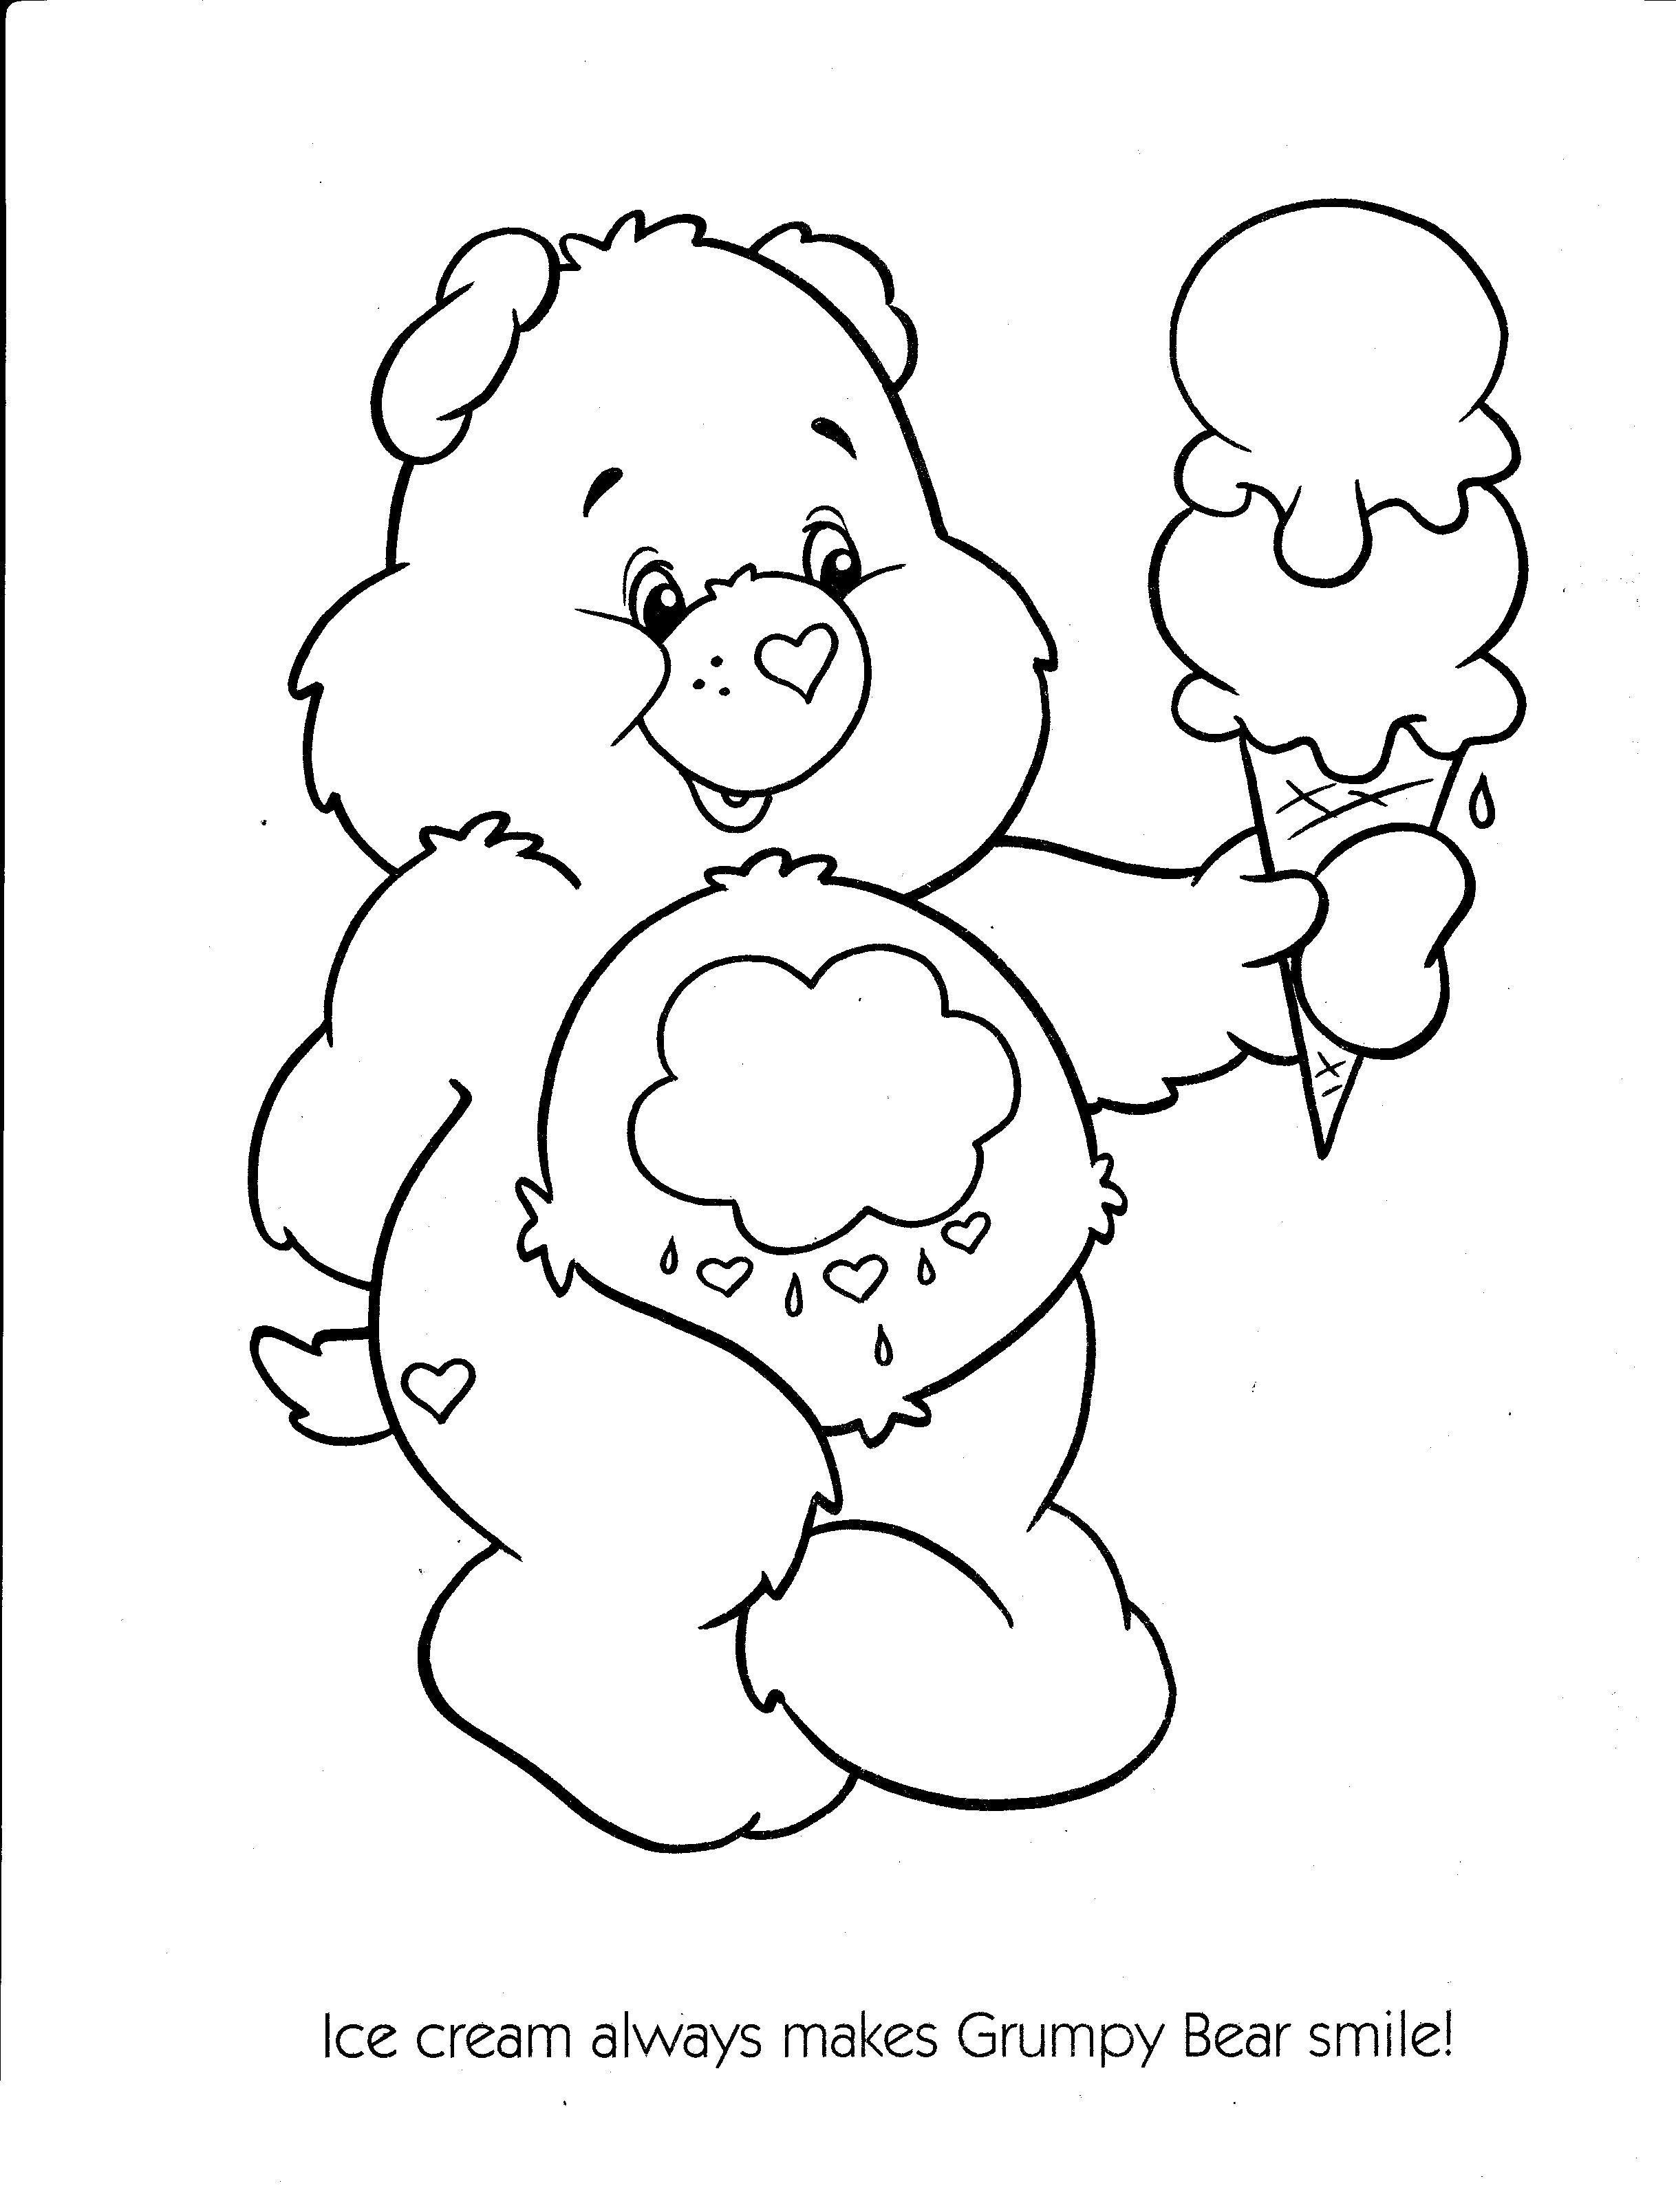 Awesome Paarden Kleurplaat Kleuren Kleurplaten Bear Coloring Pages Coloring Books Coloring Pages